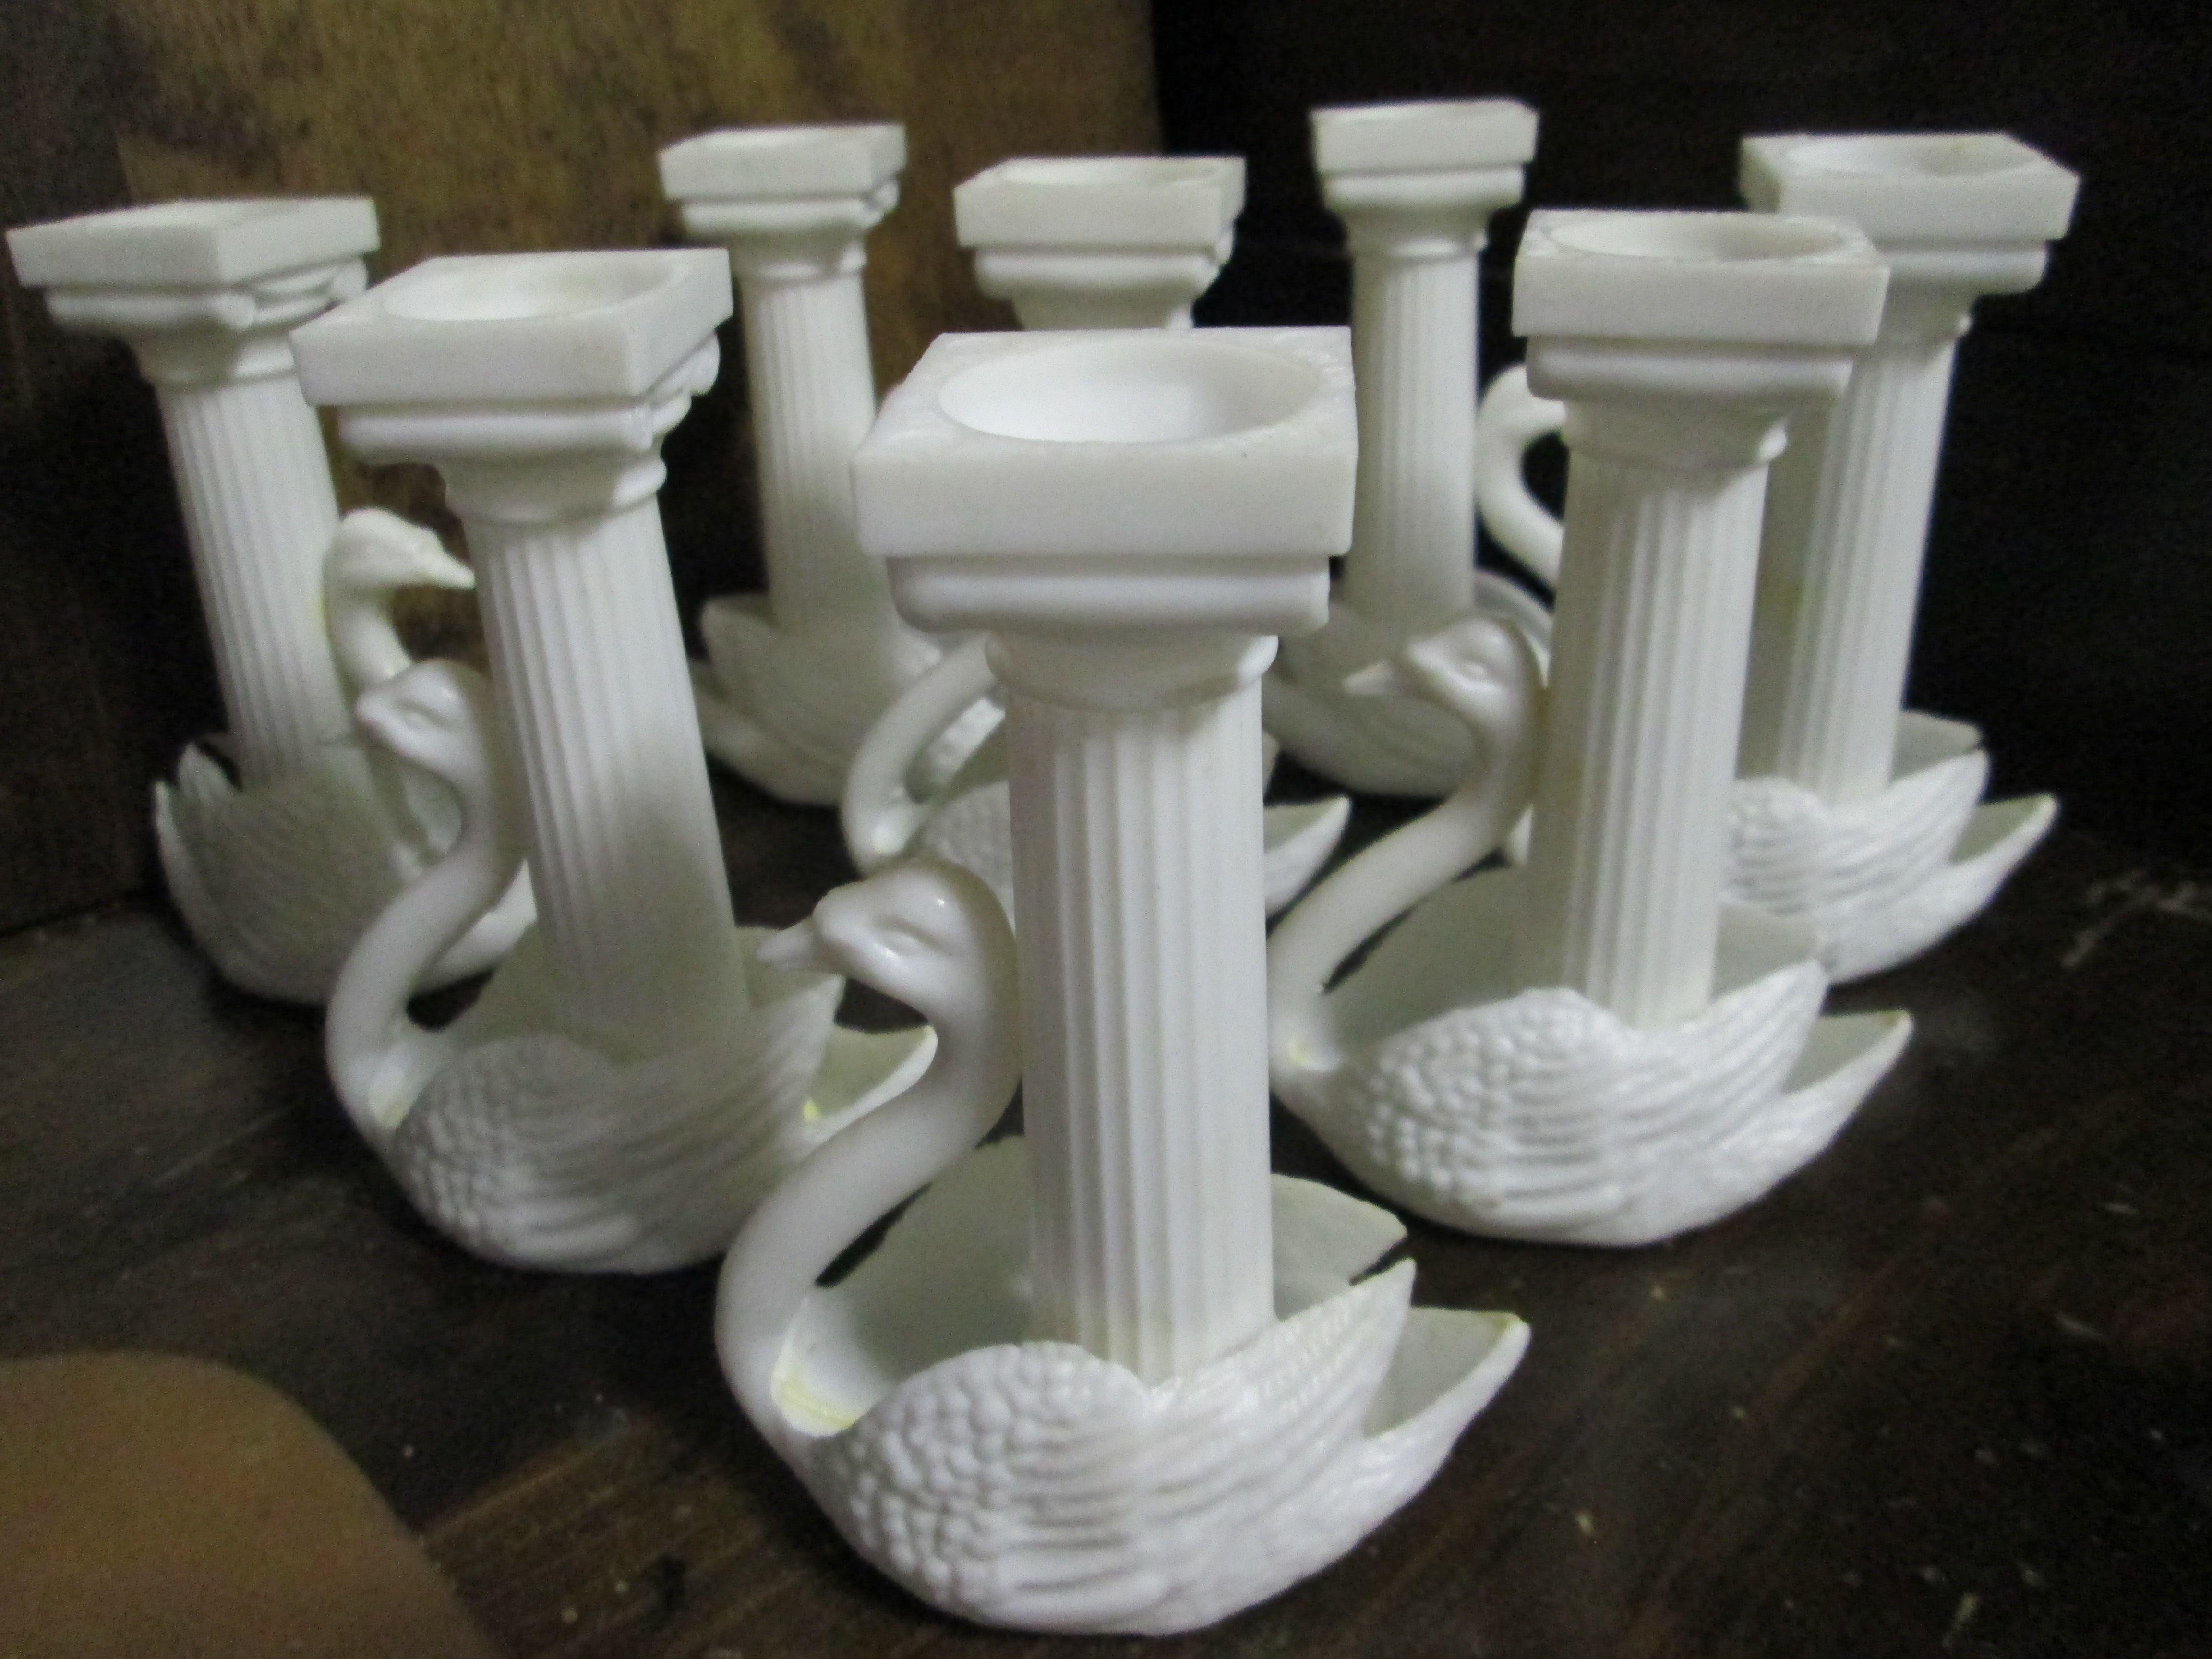 Wilton Vintage Swan Cake Pillars Columns White Plastic Swans From The 1970s Cake Pillars Wilton Vintage